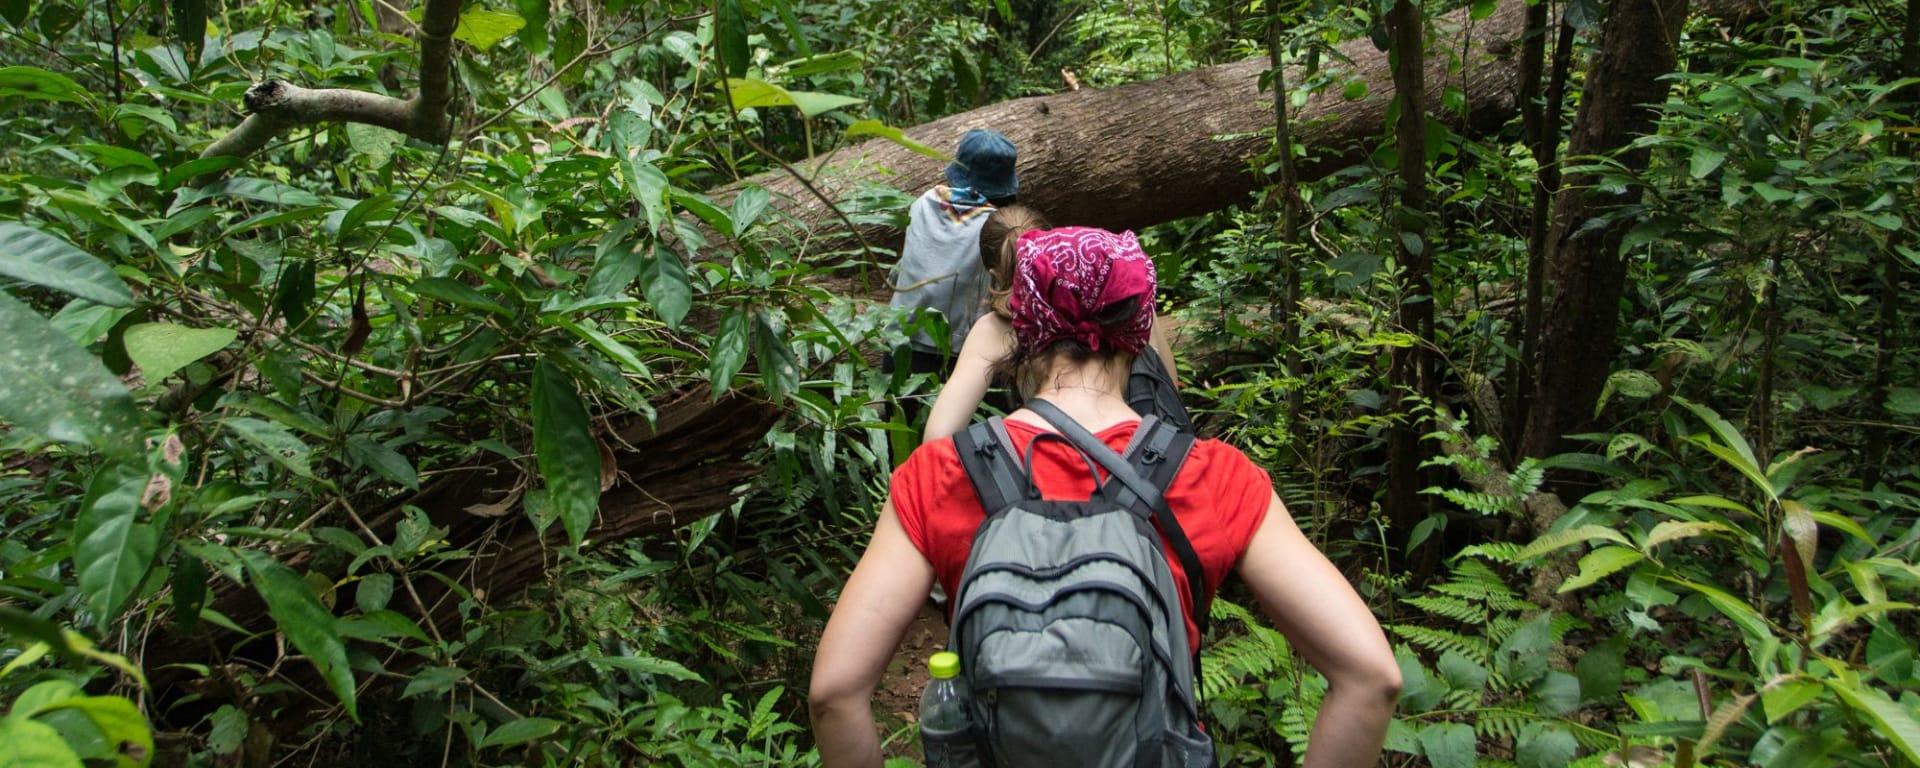 Unbekannter I-San ab Bangkok: Khao Yai national park - Tourists hiking in the deep jungle